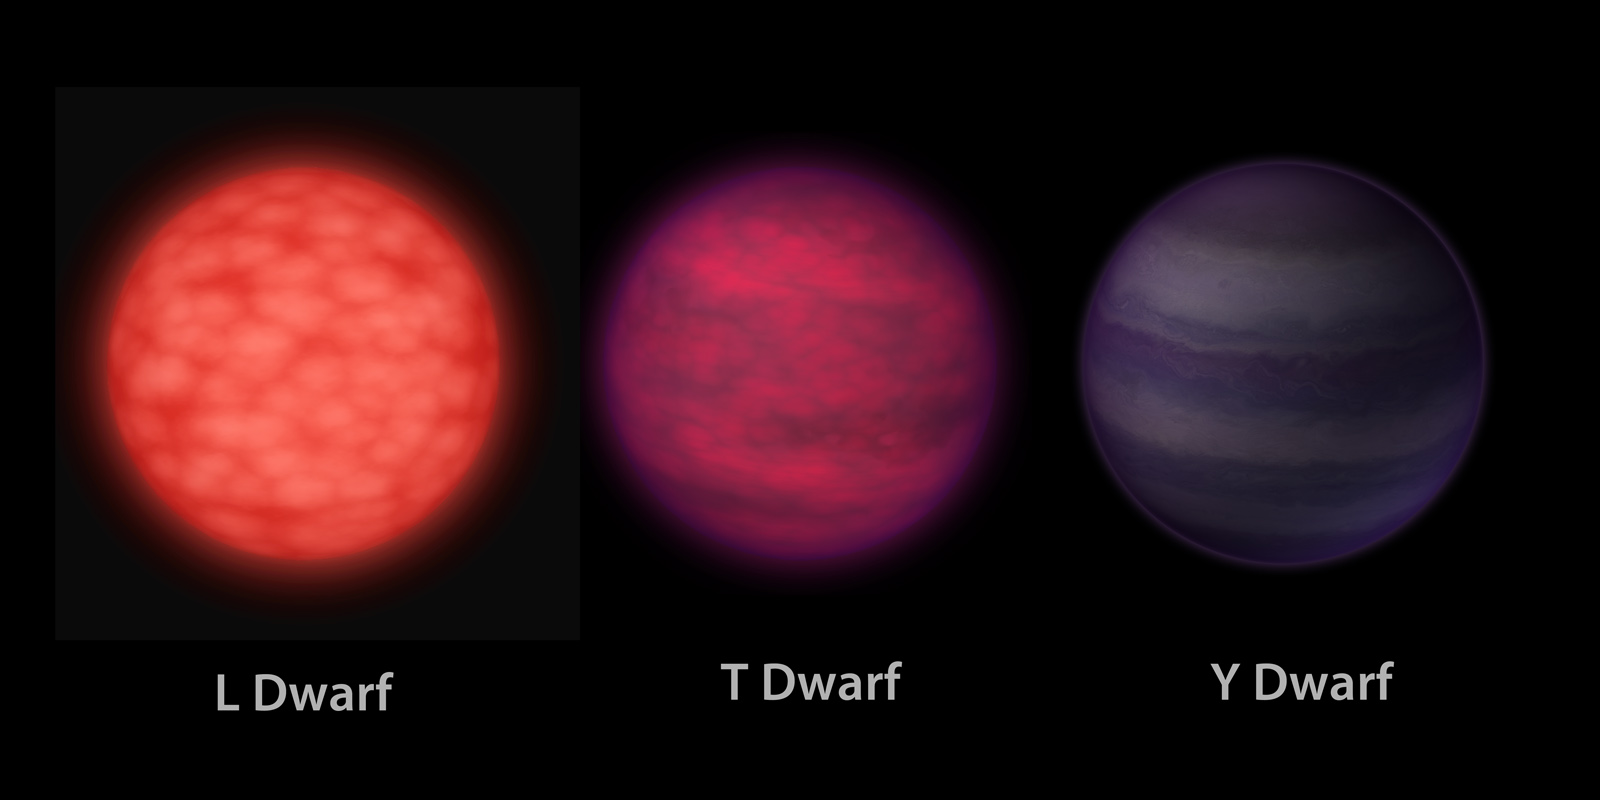 WISE - Multimedia Gallery: A Trio of Brown Dwarfs